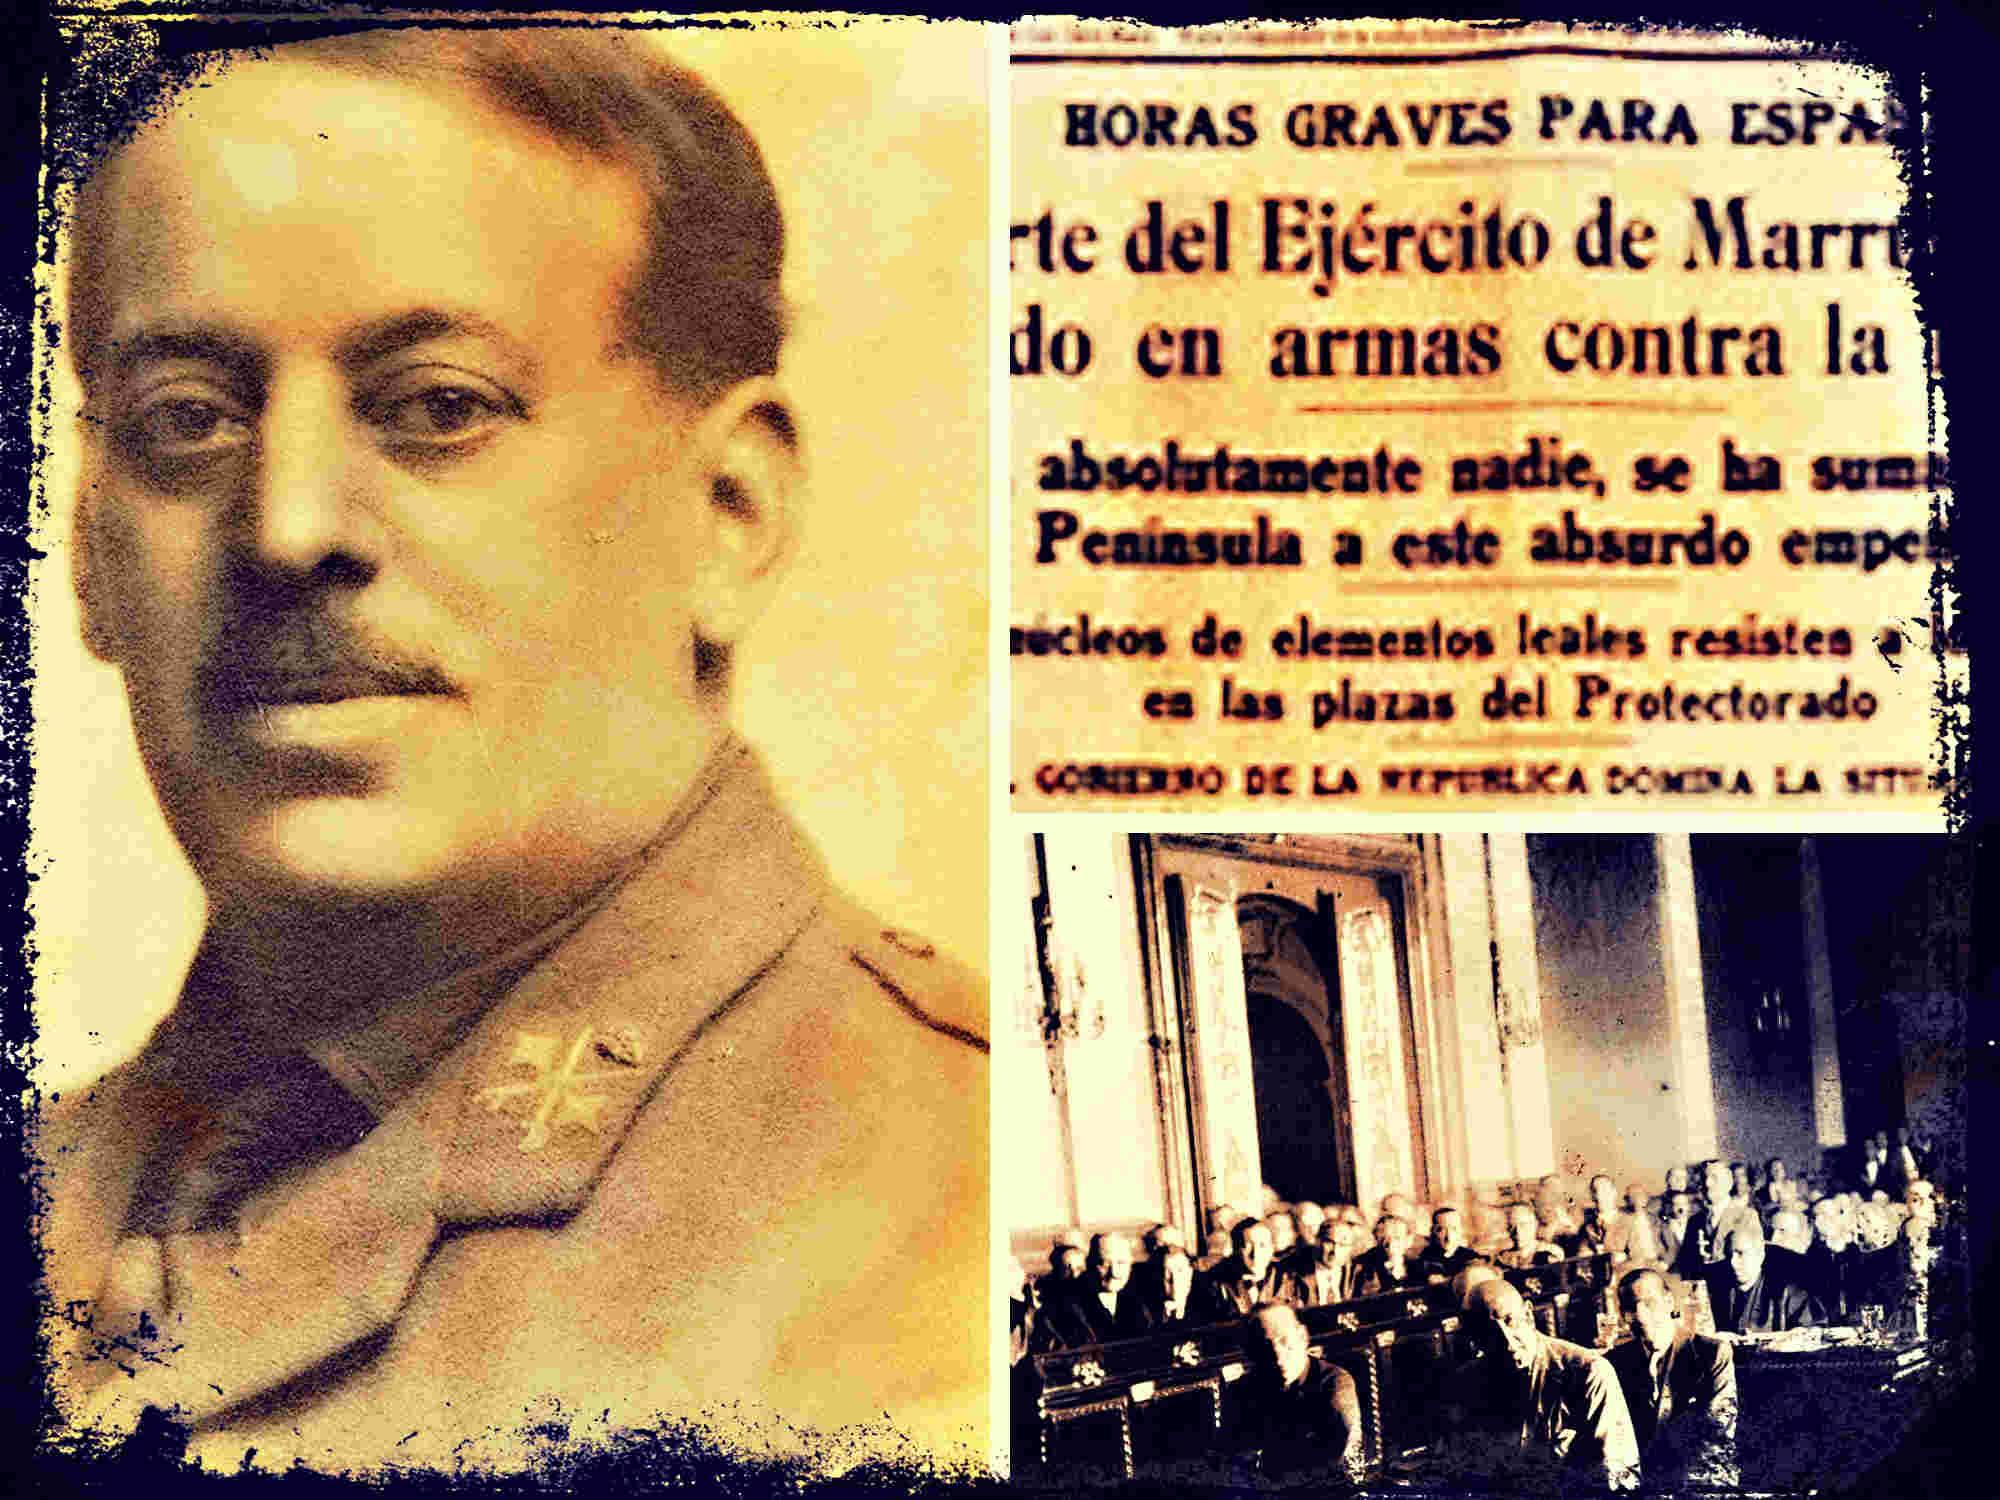 La Sanjurjada: primer golpe de estado contra la democracia republicana